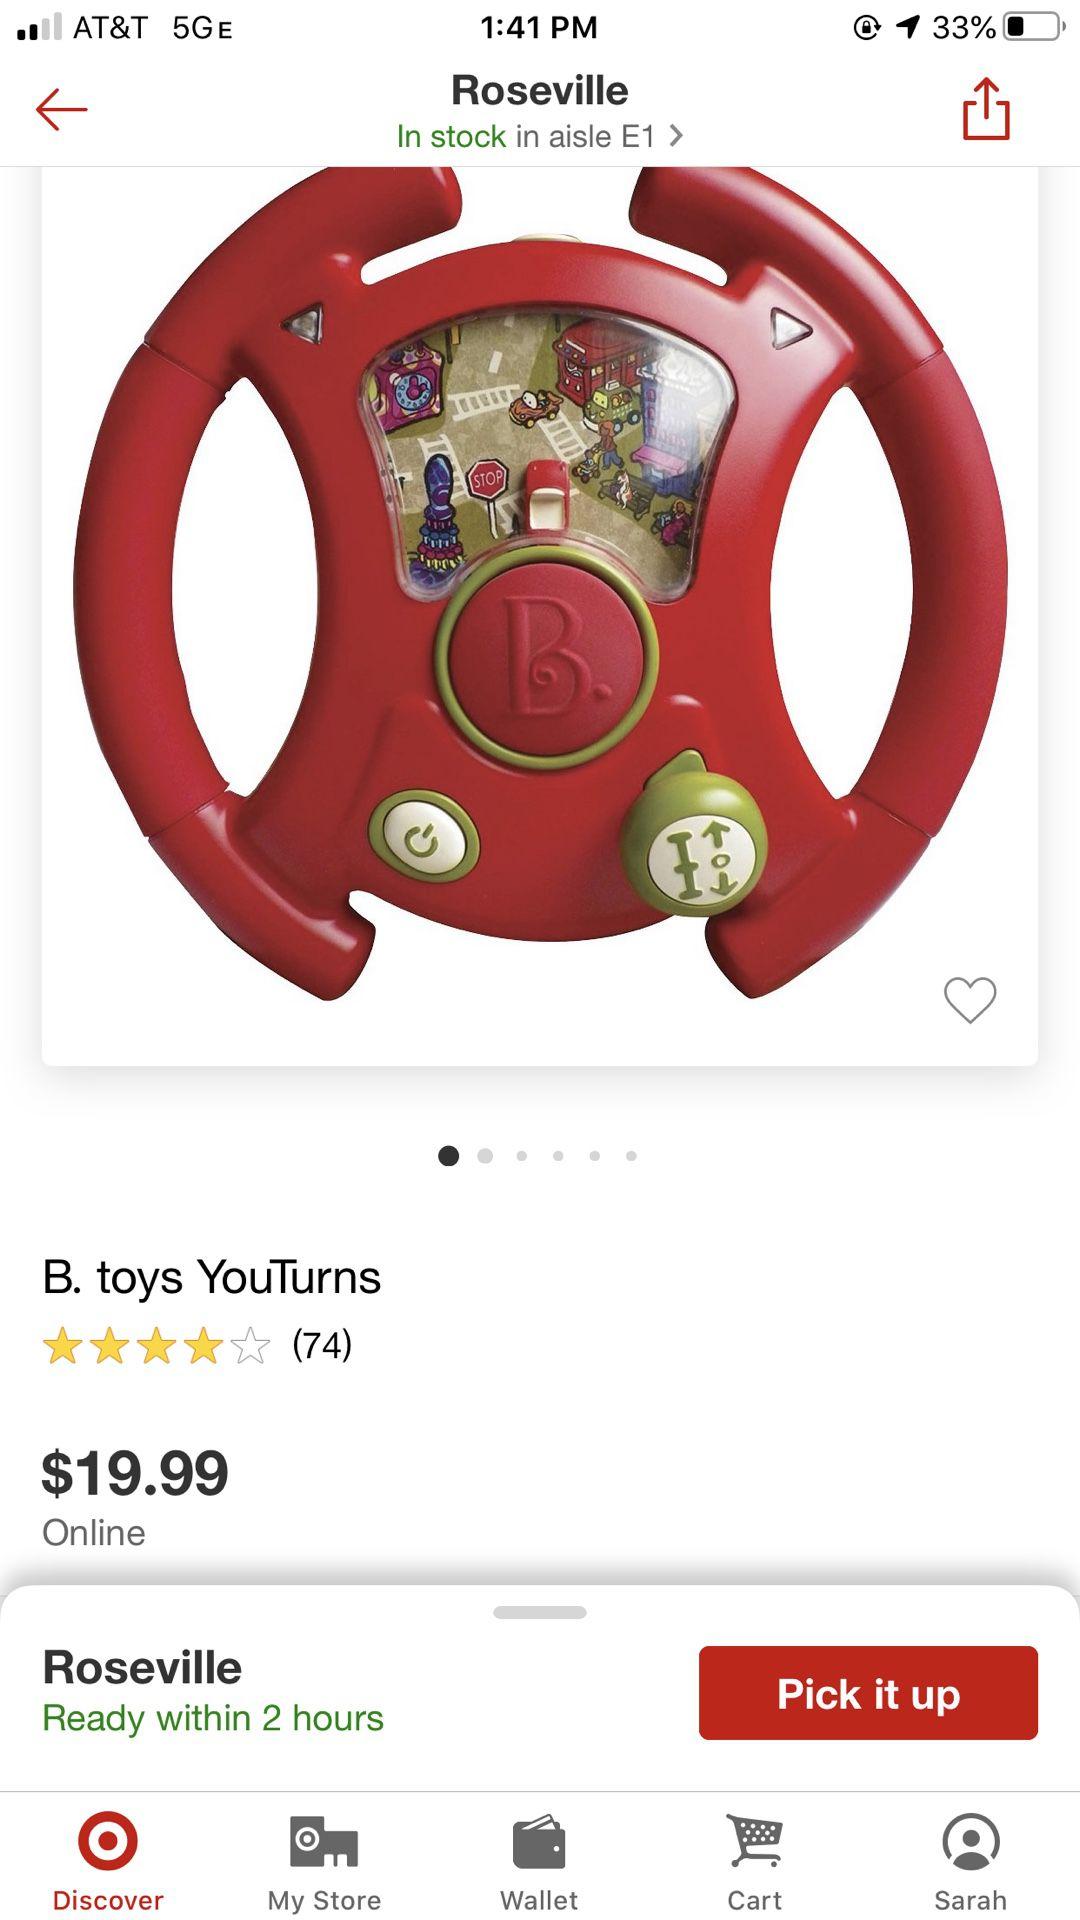 B. Toys YouTurns